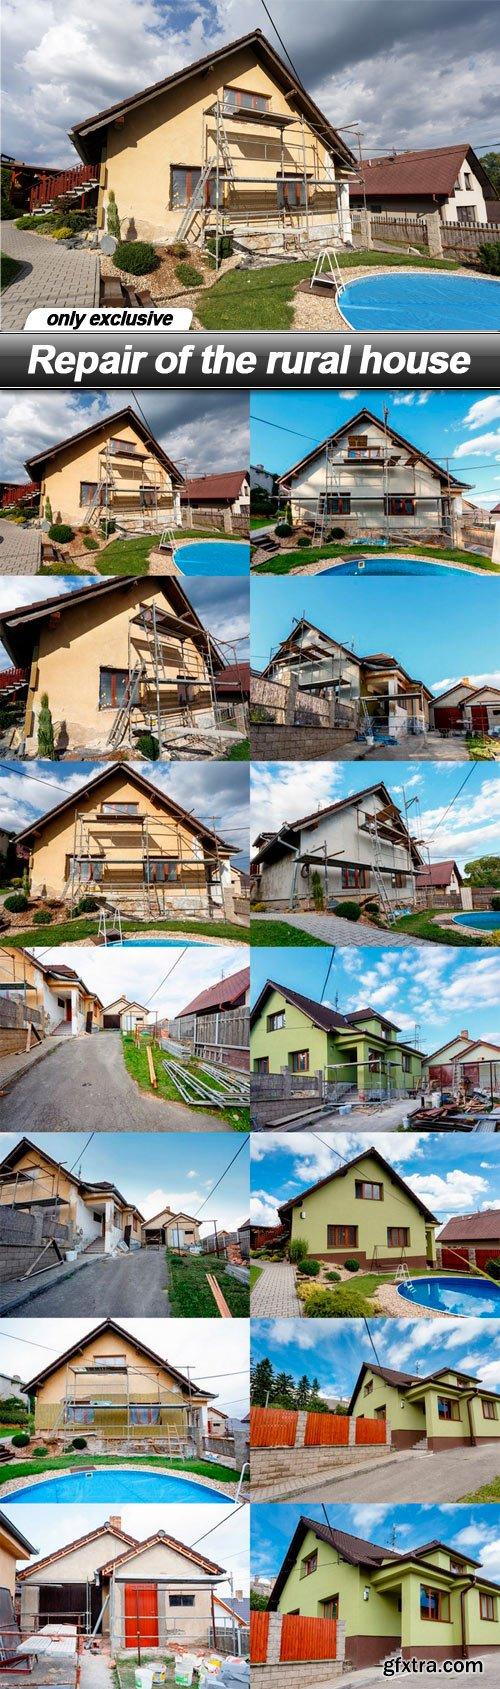 Repair of the rural house - 15 UHQ JPEG